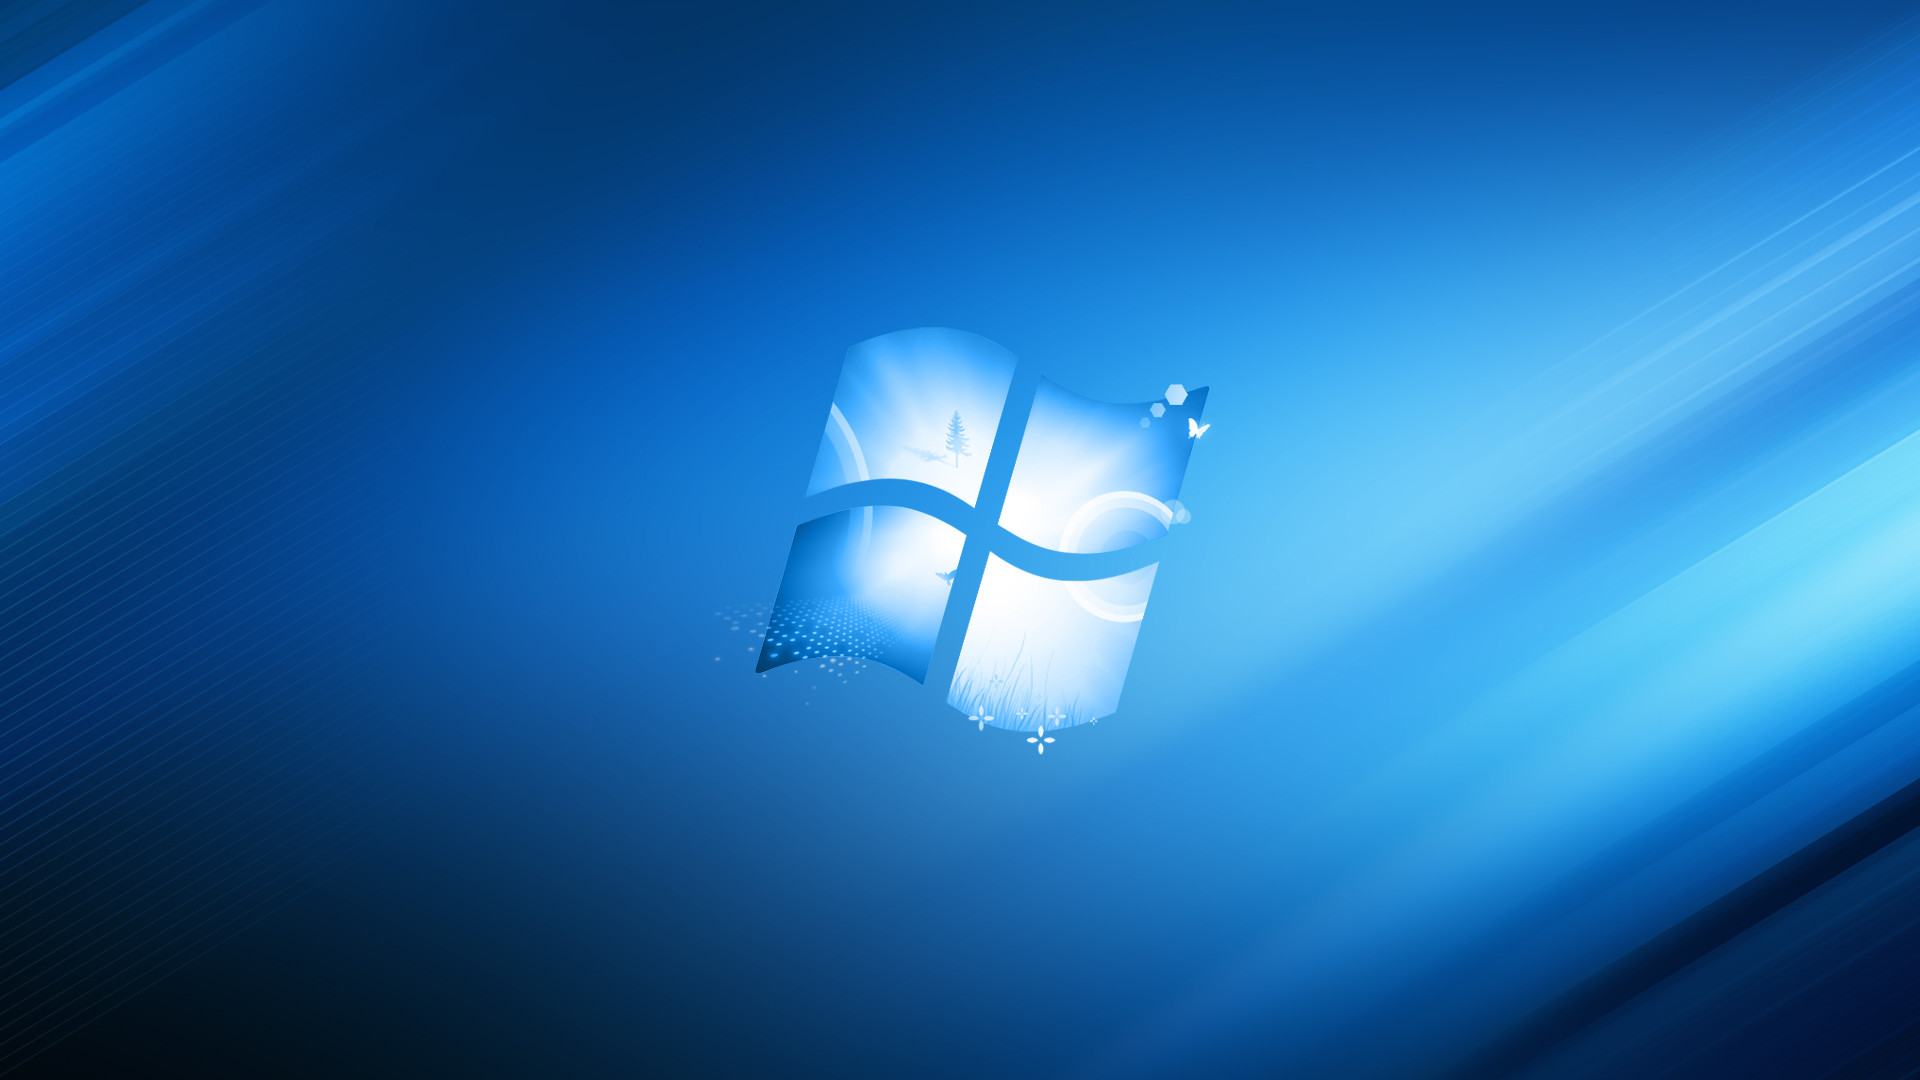 1920x1080 Beautiful Windows 8 Free Wallpaper Download Seiten